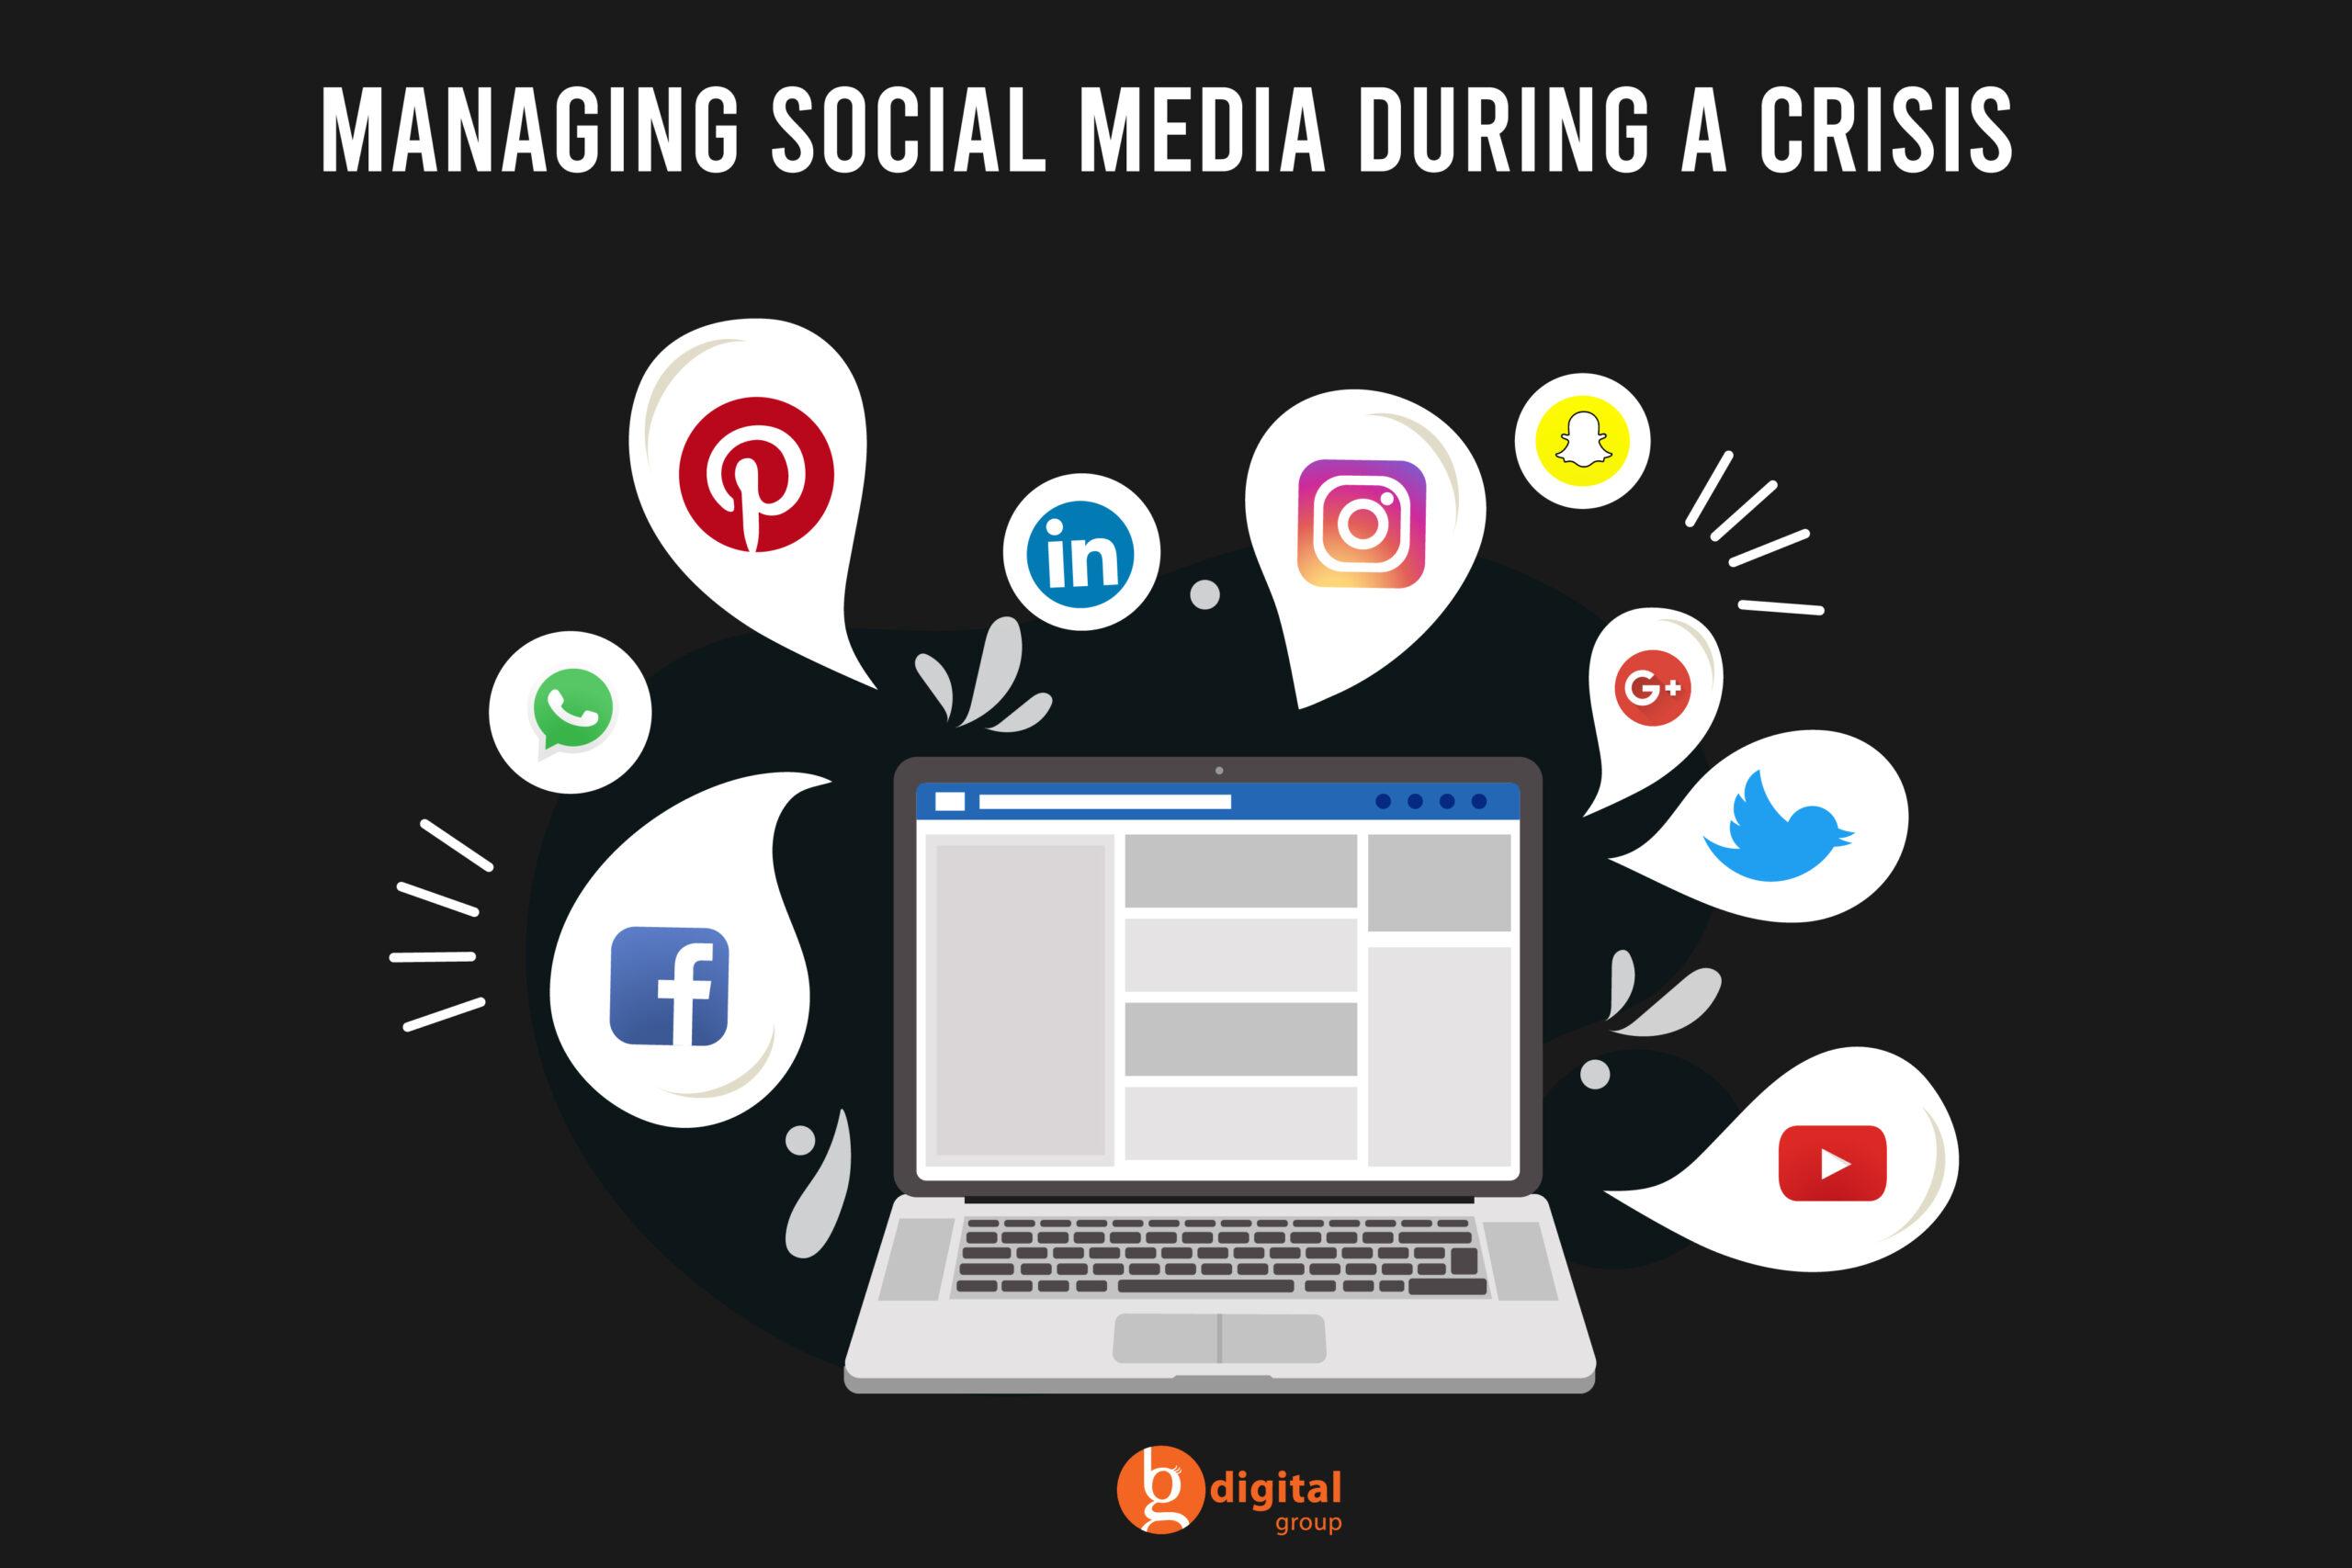 BG_social media crisis-01 (1)